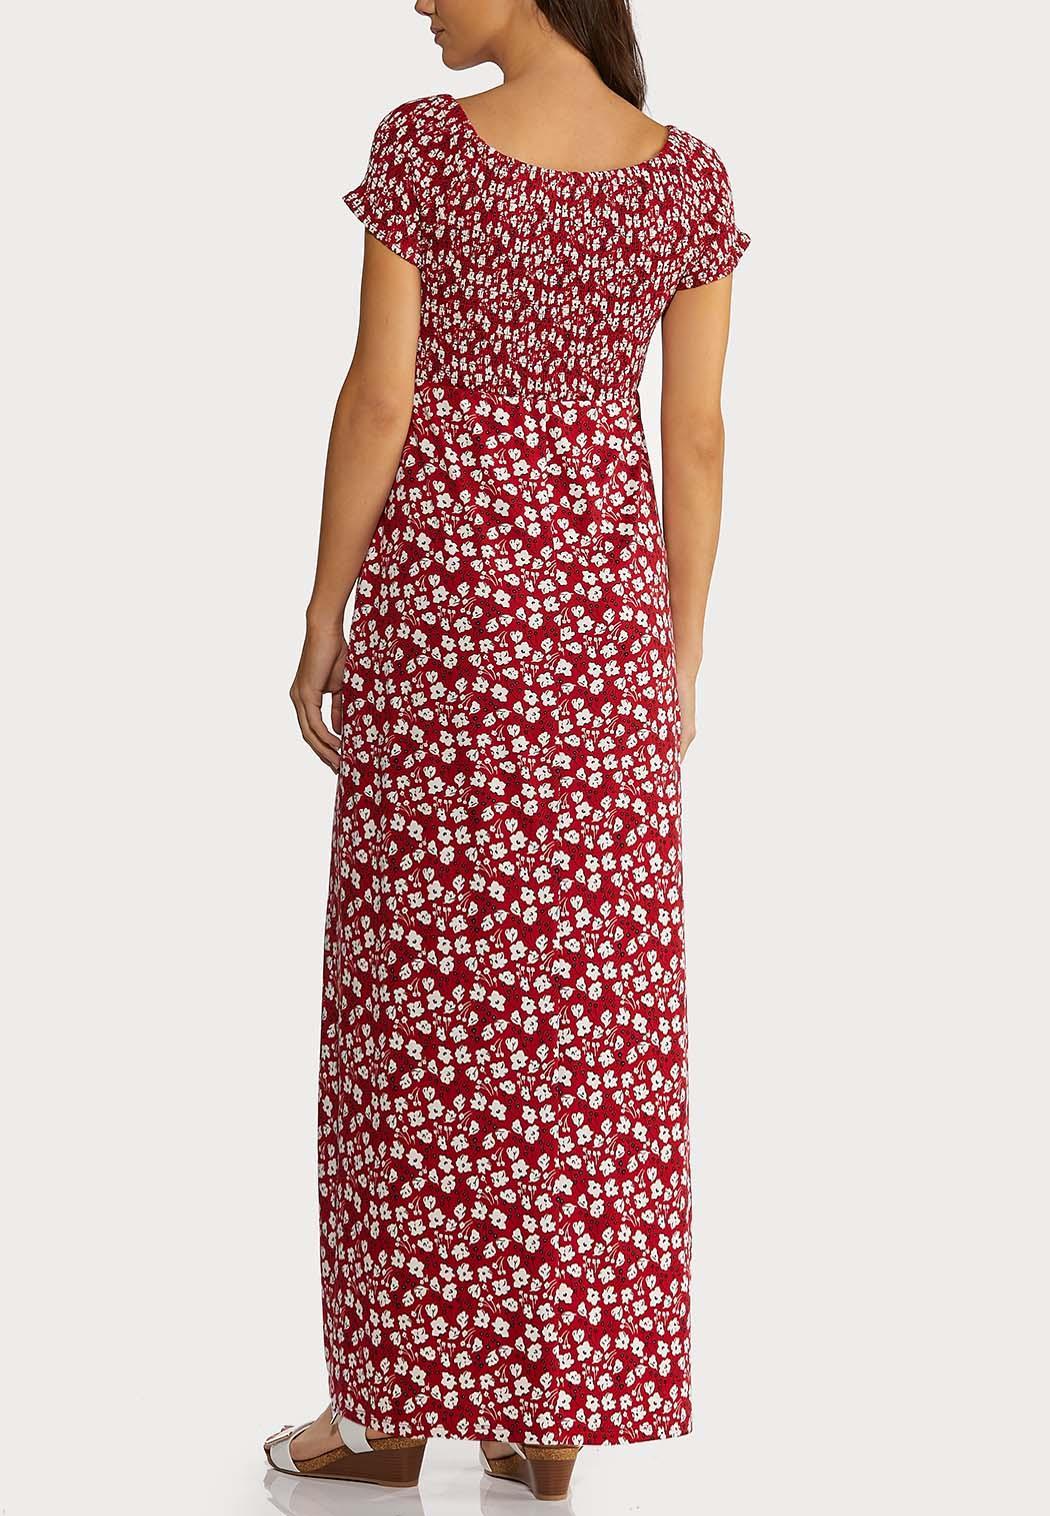 Plus Size Smocked Floral Maxi Dress (Item #44194647)